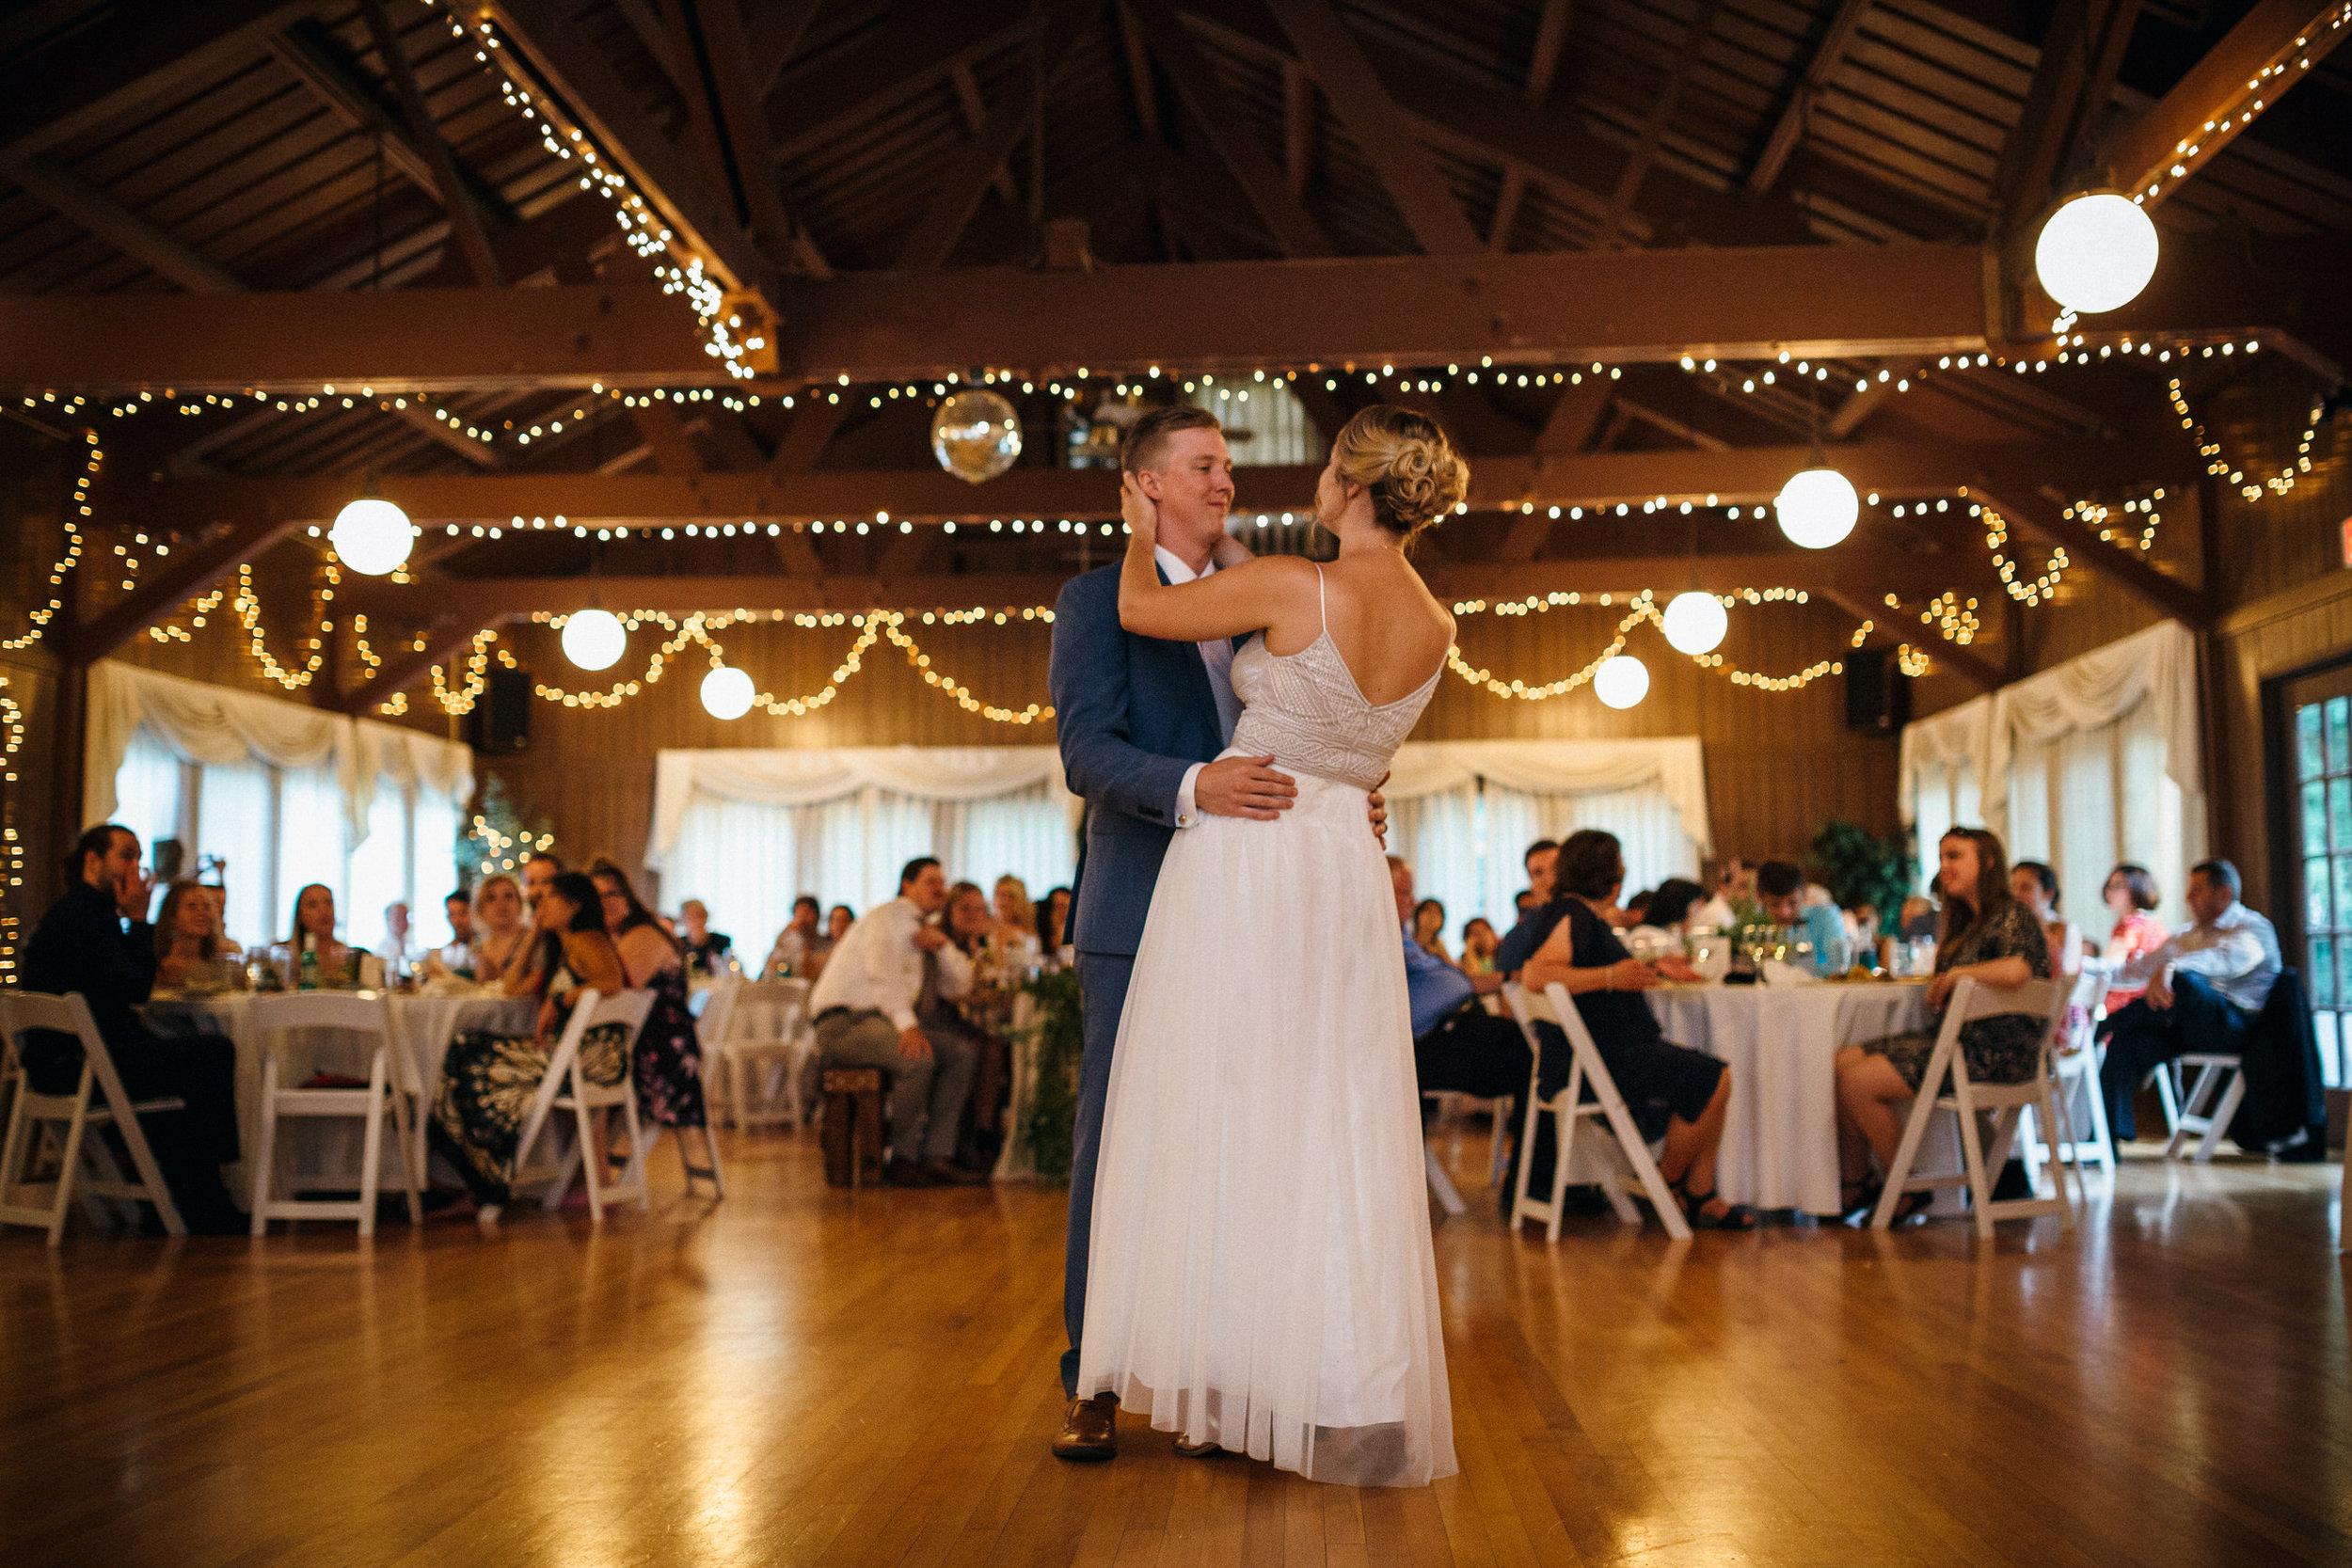 Laurelhurst Park club wedding photographer Portand pdx Oregon095.JPG